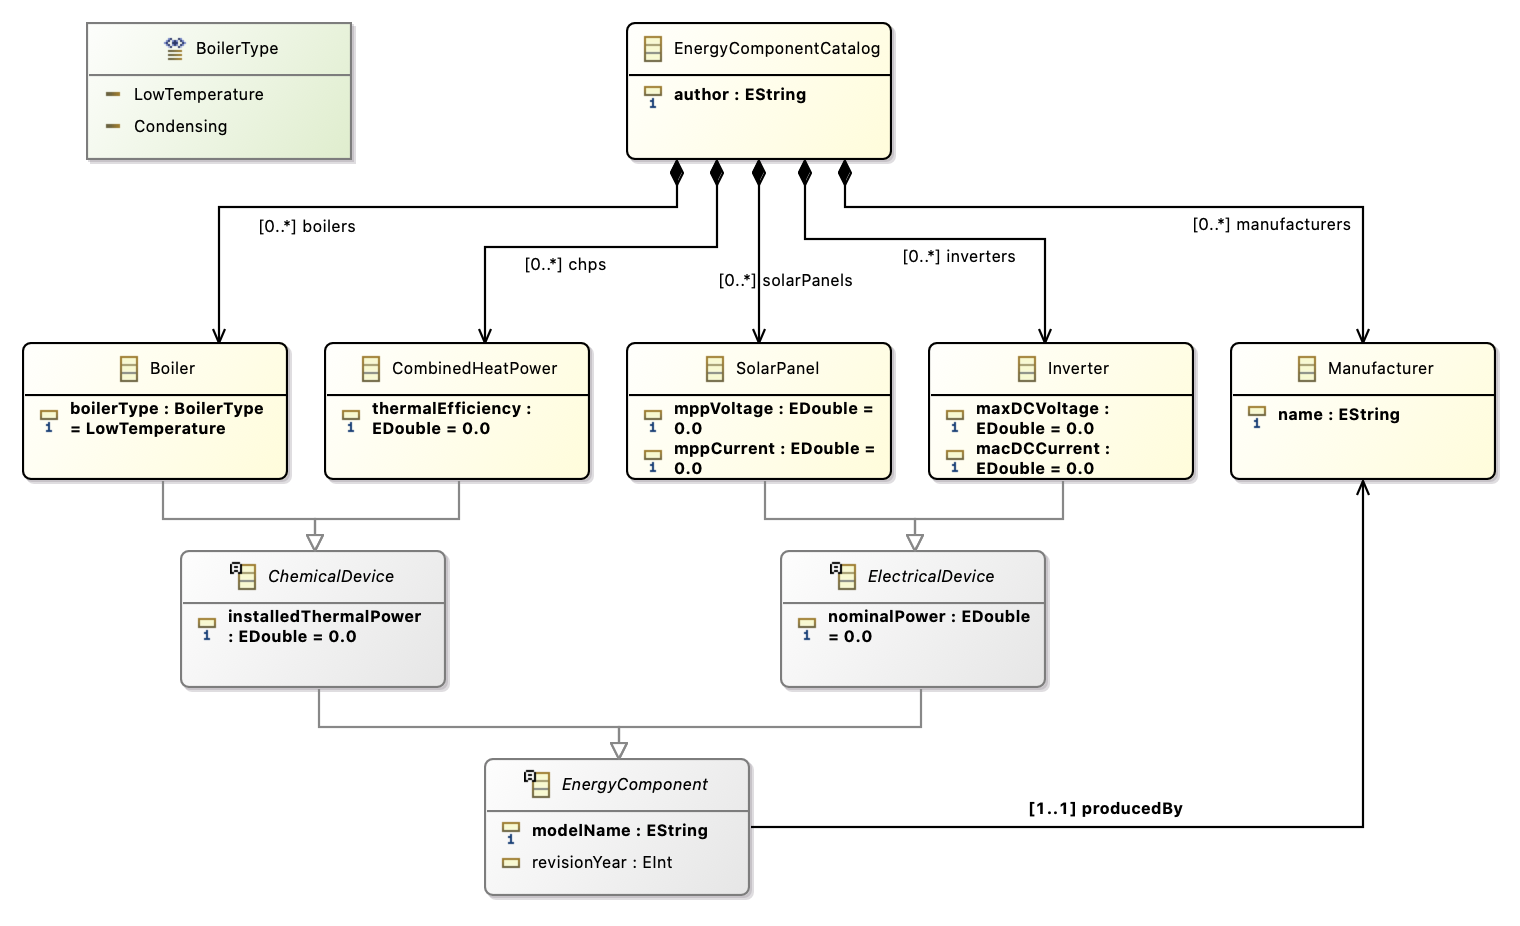 ParameterCatalogs2Images/Homework.png